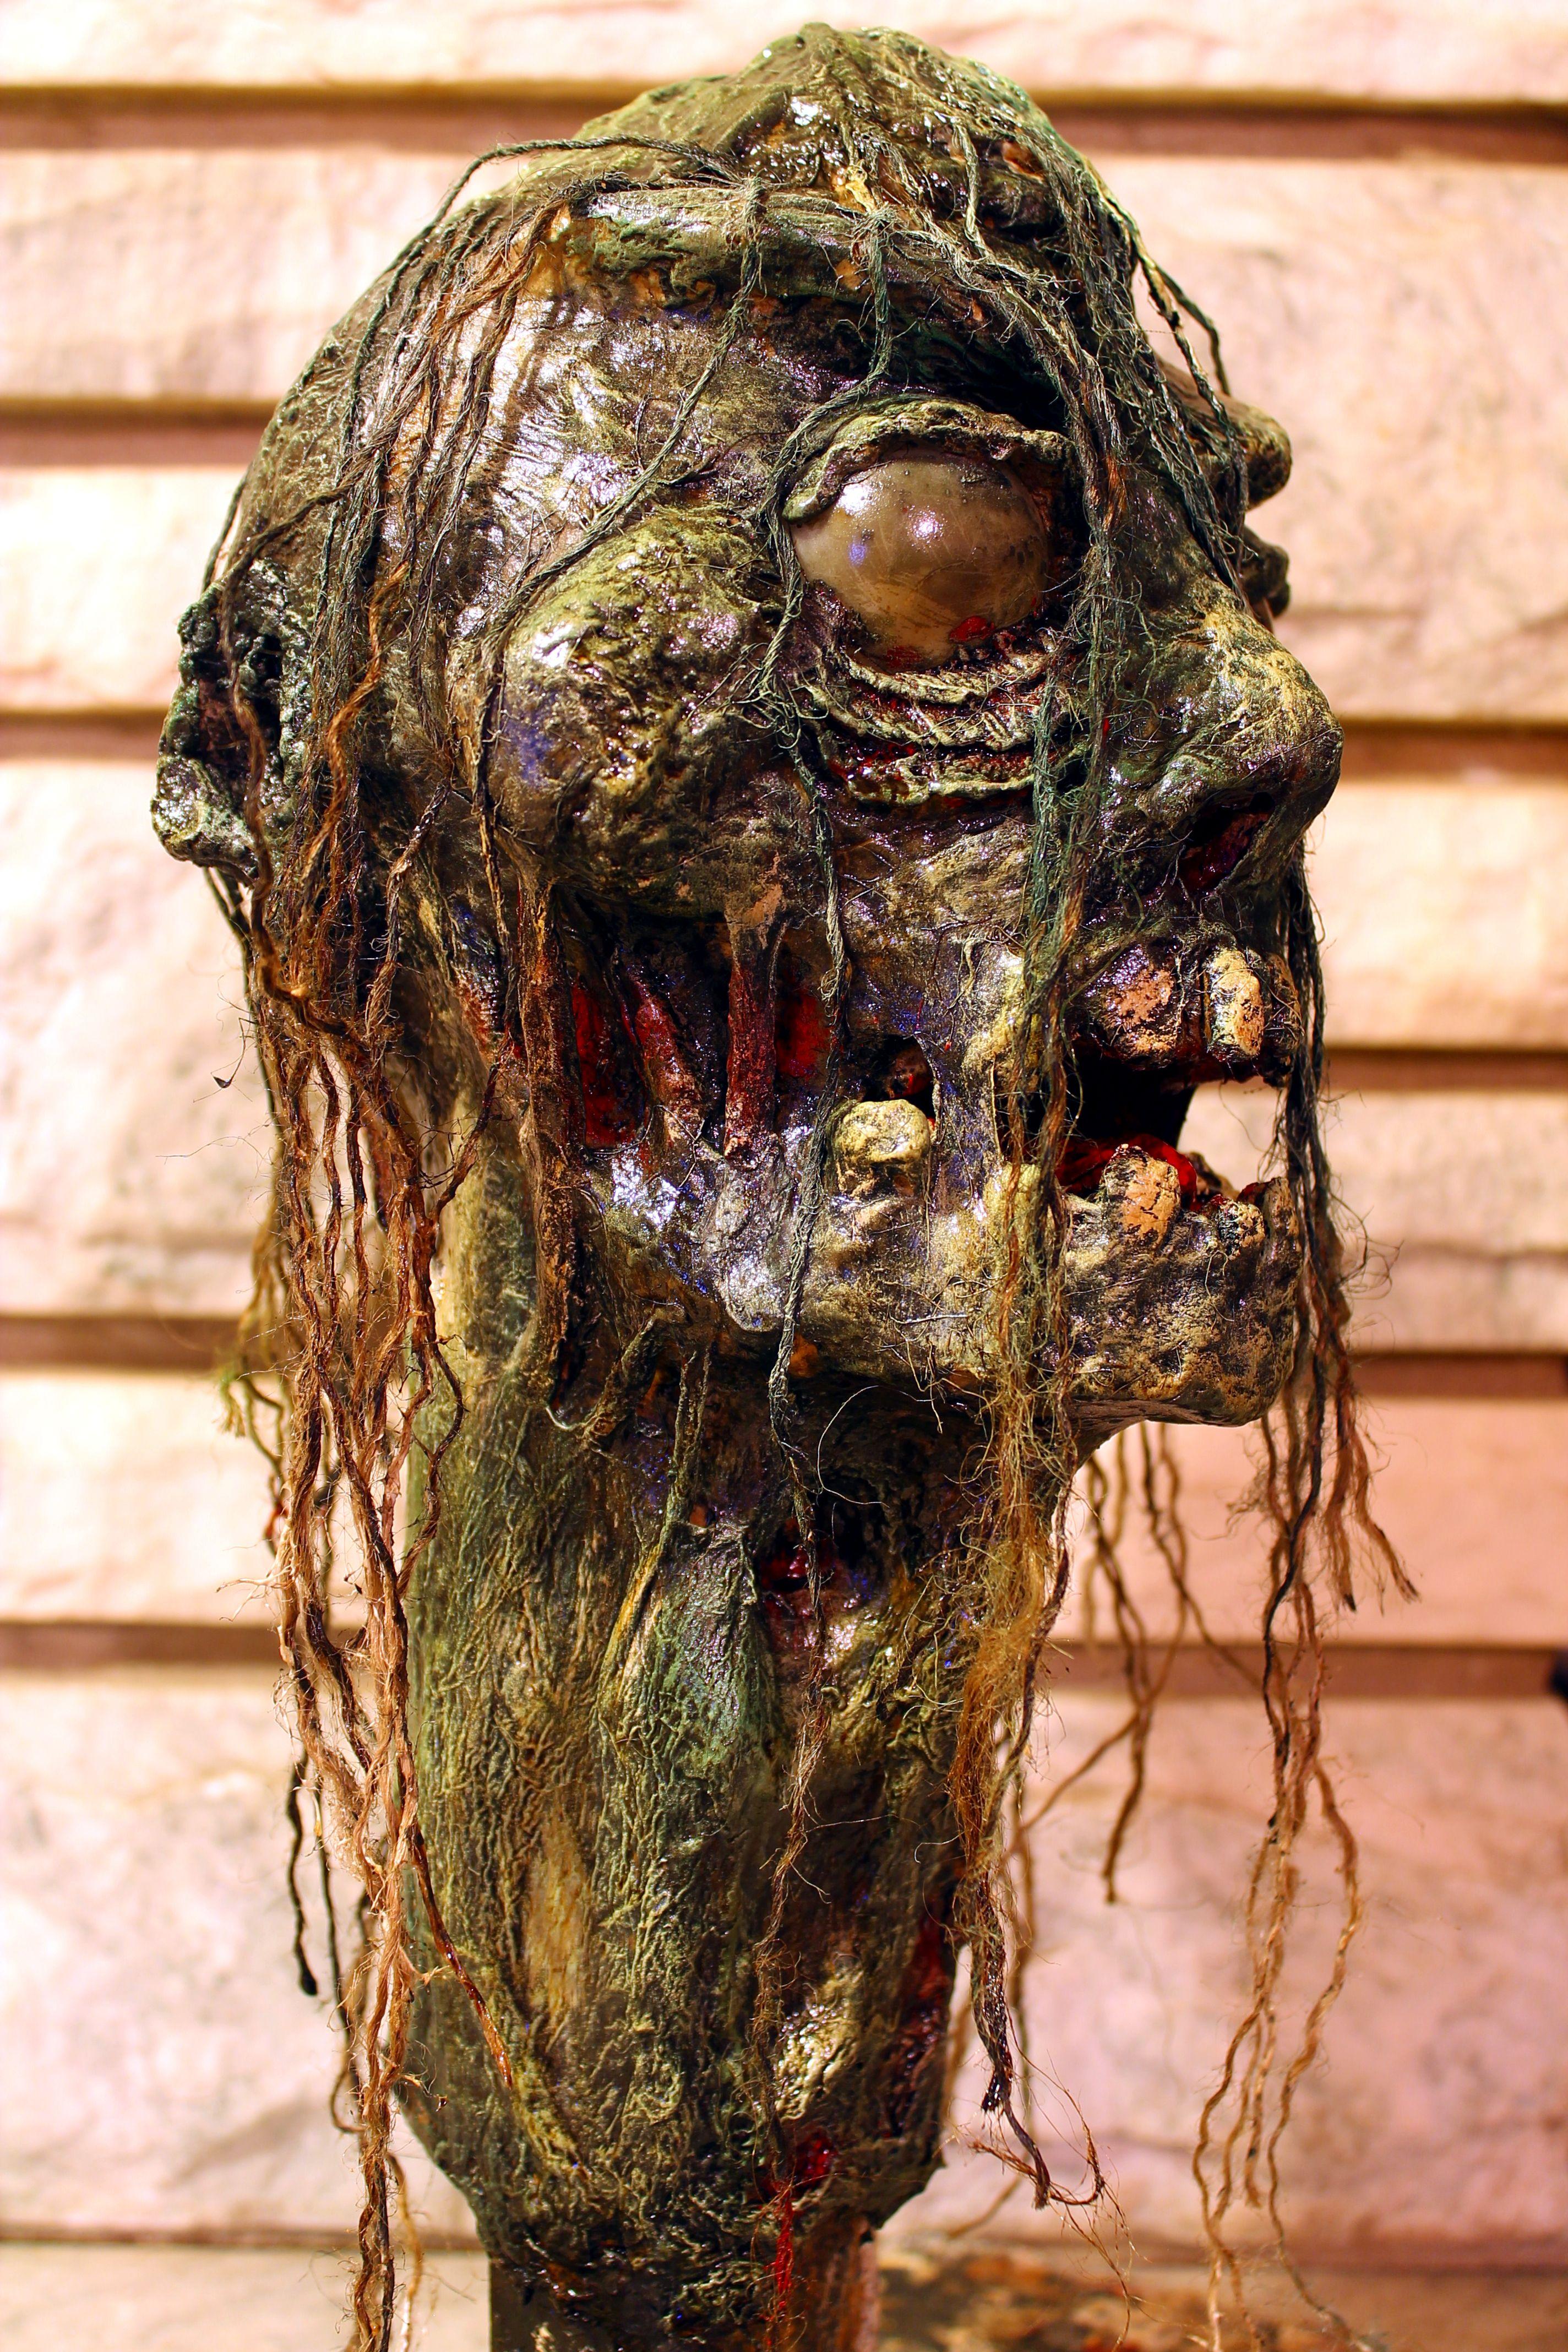 Nefarious Paper mache zombie head